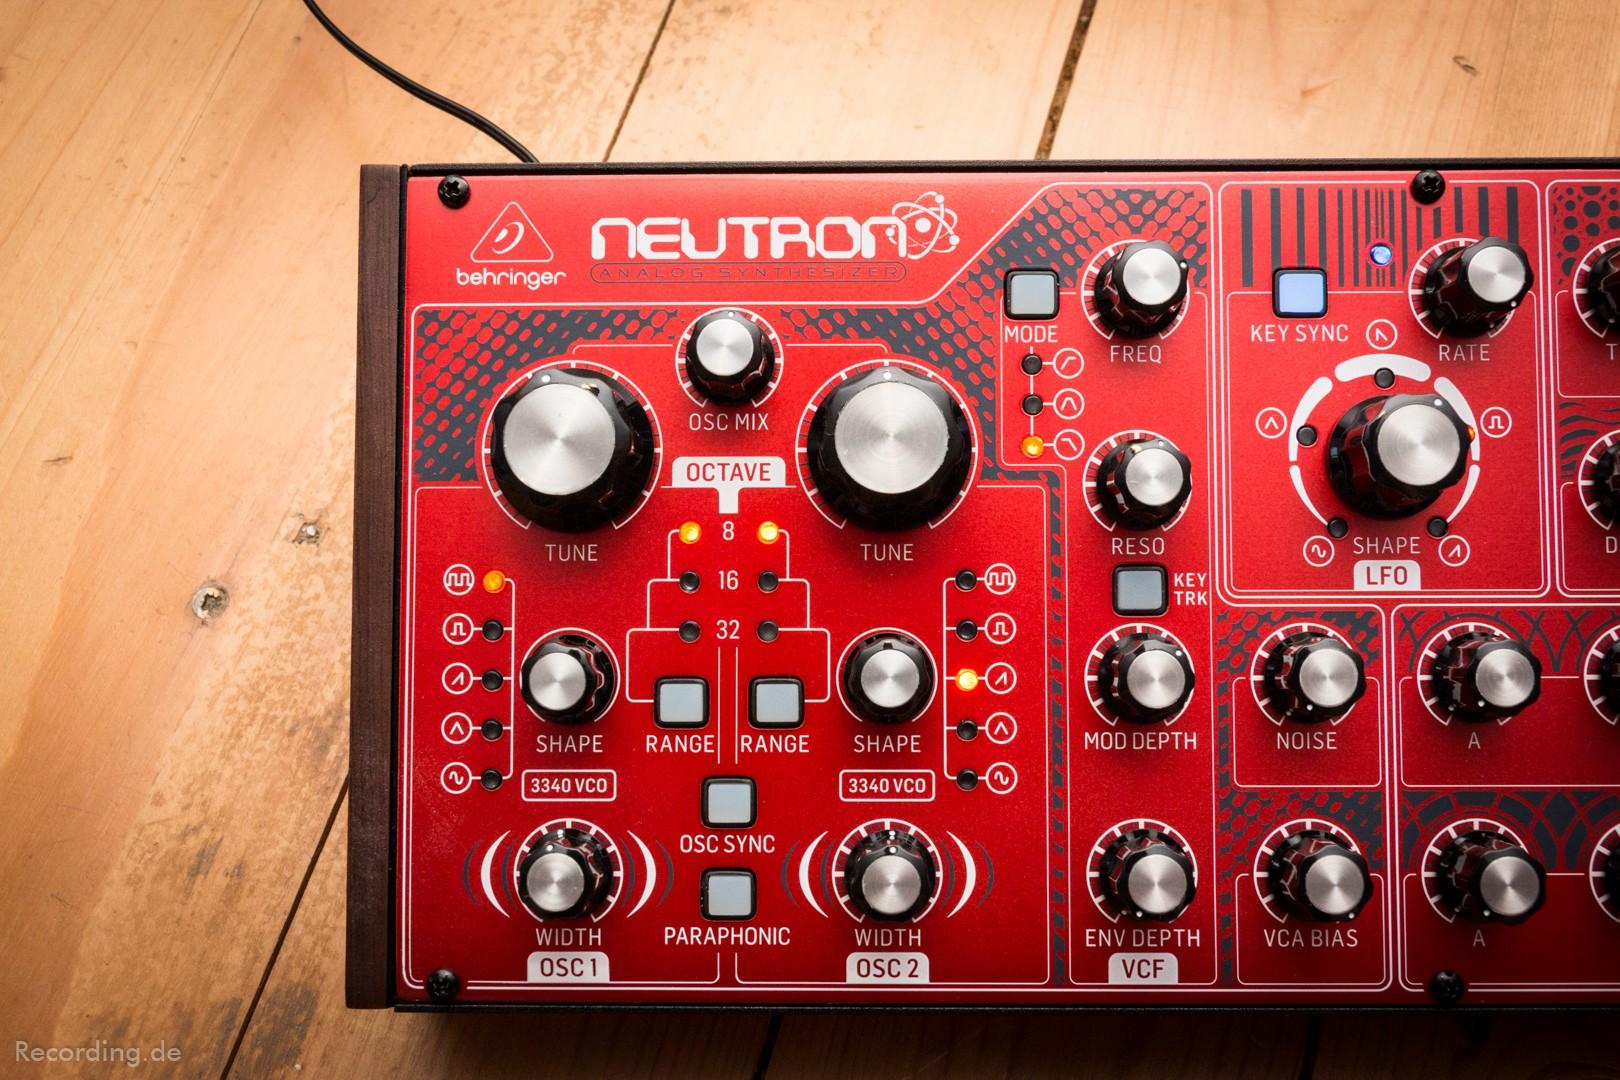 Neutron-006.jpg